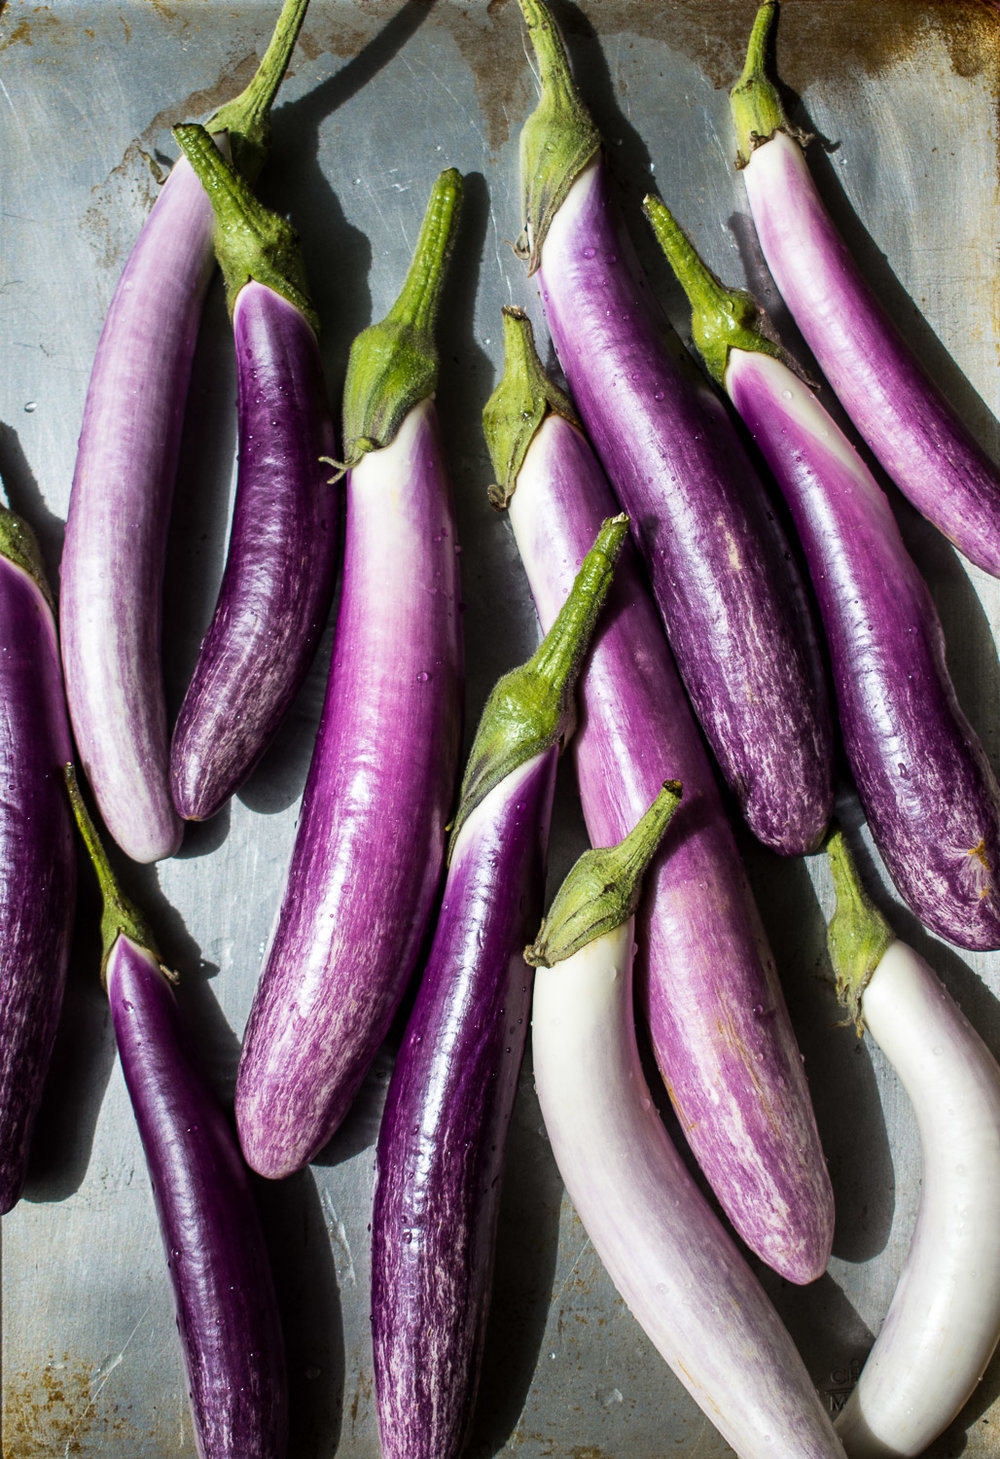 Bride eggplant before roasting.